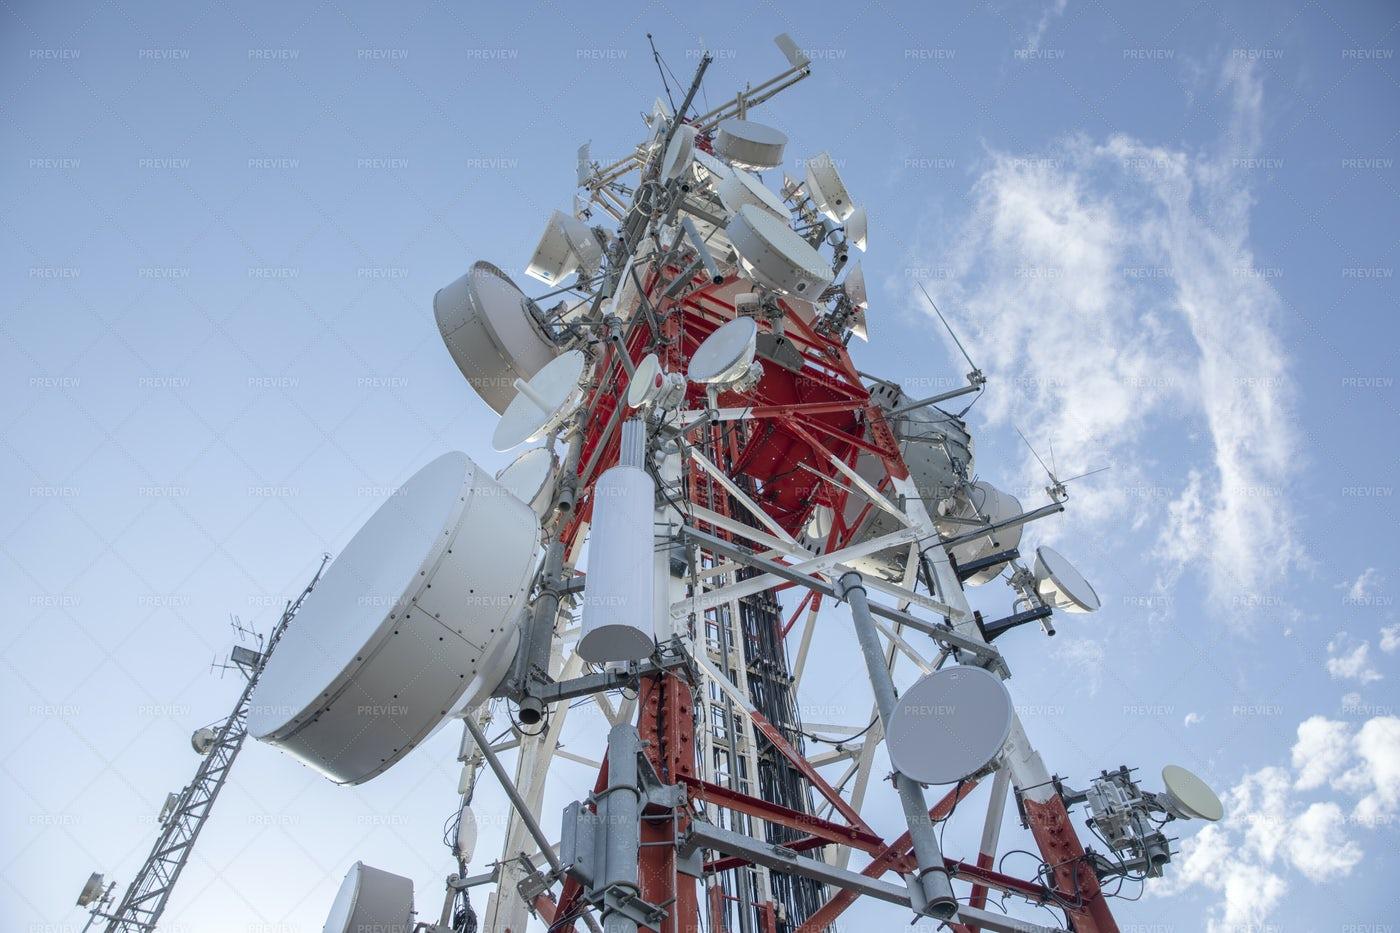 Radio Tower During Daytime: Stock Photos